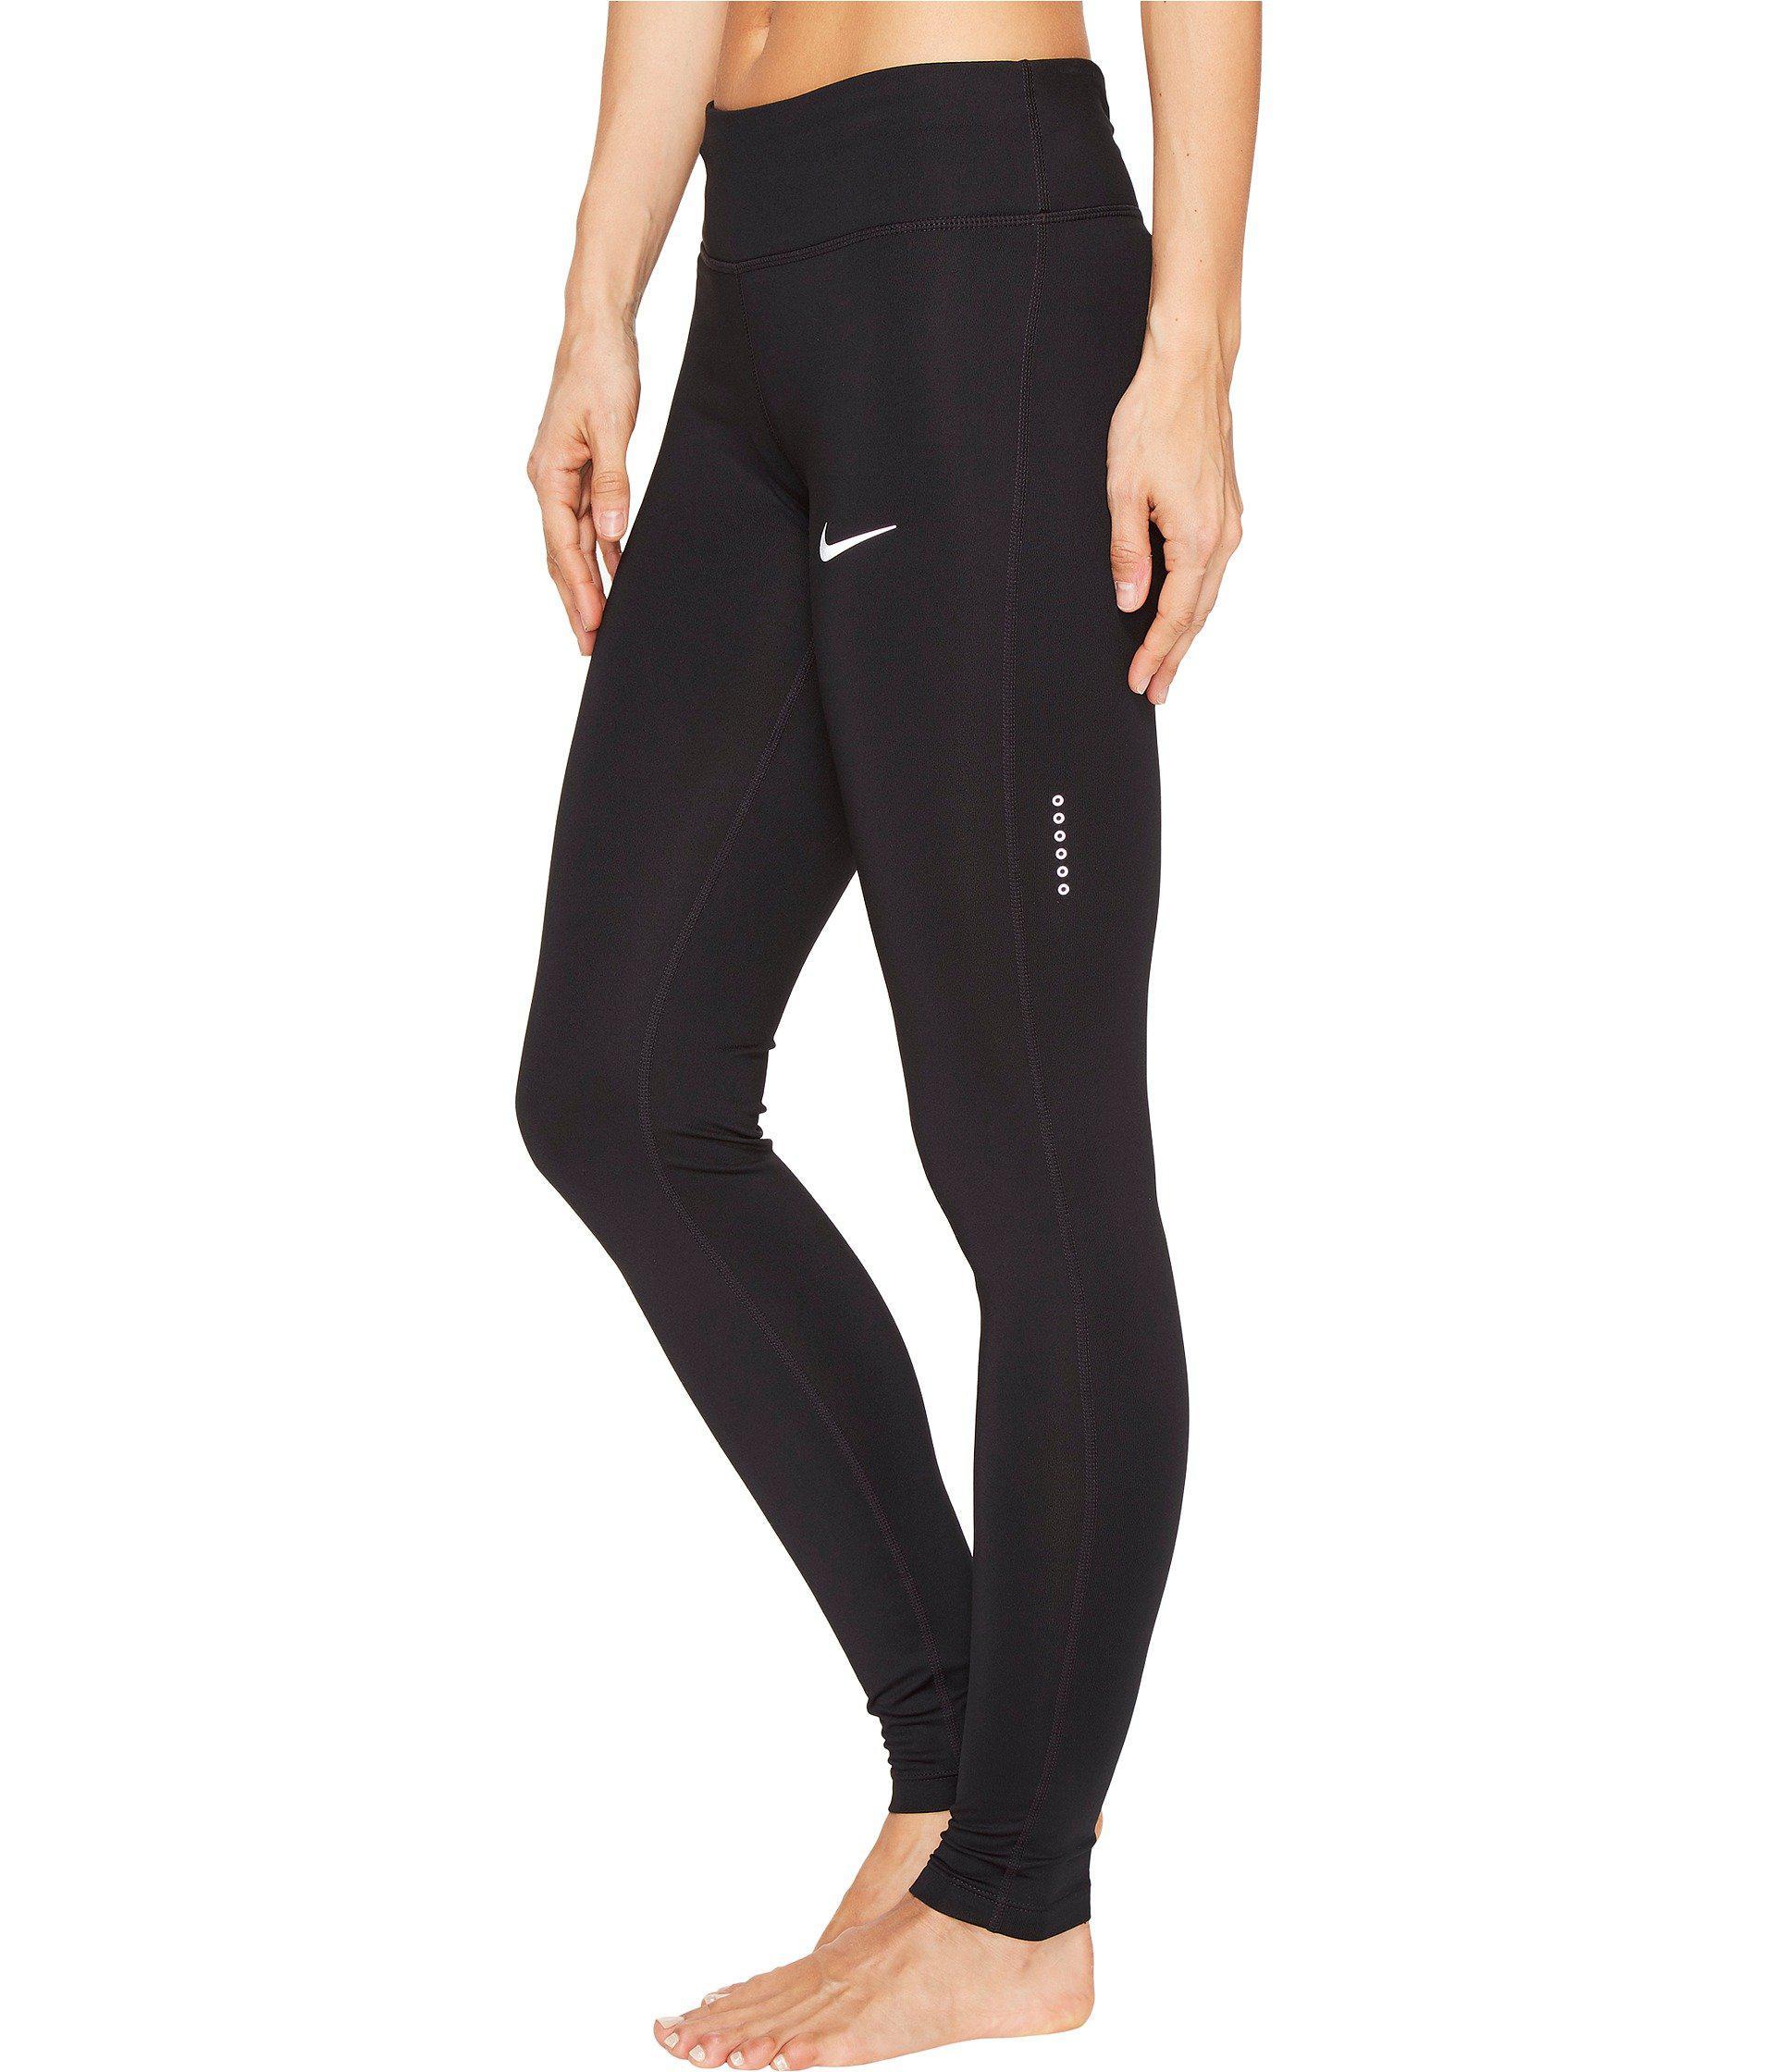 777f761249 Lyst - Nike Power Essential Running Tight (black/black) Women's ...